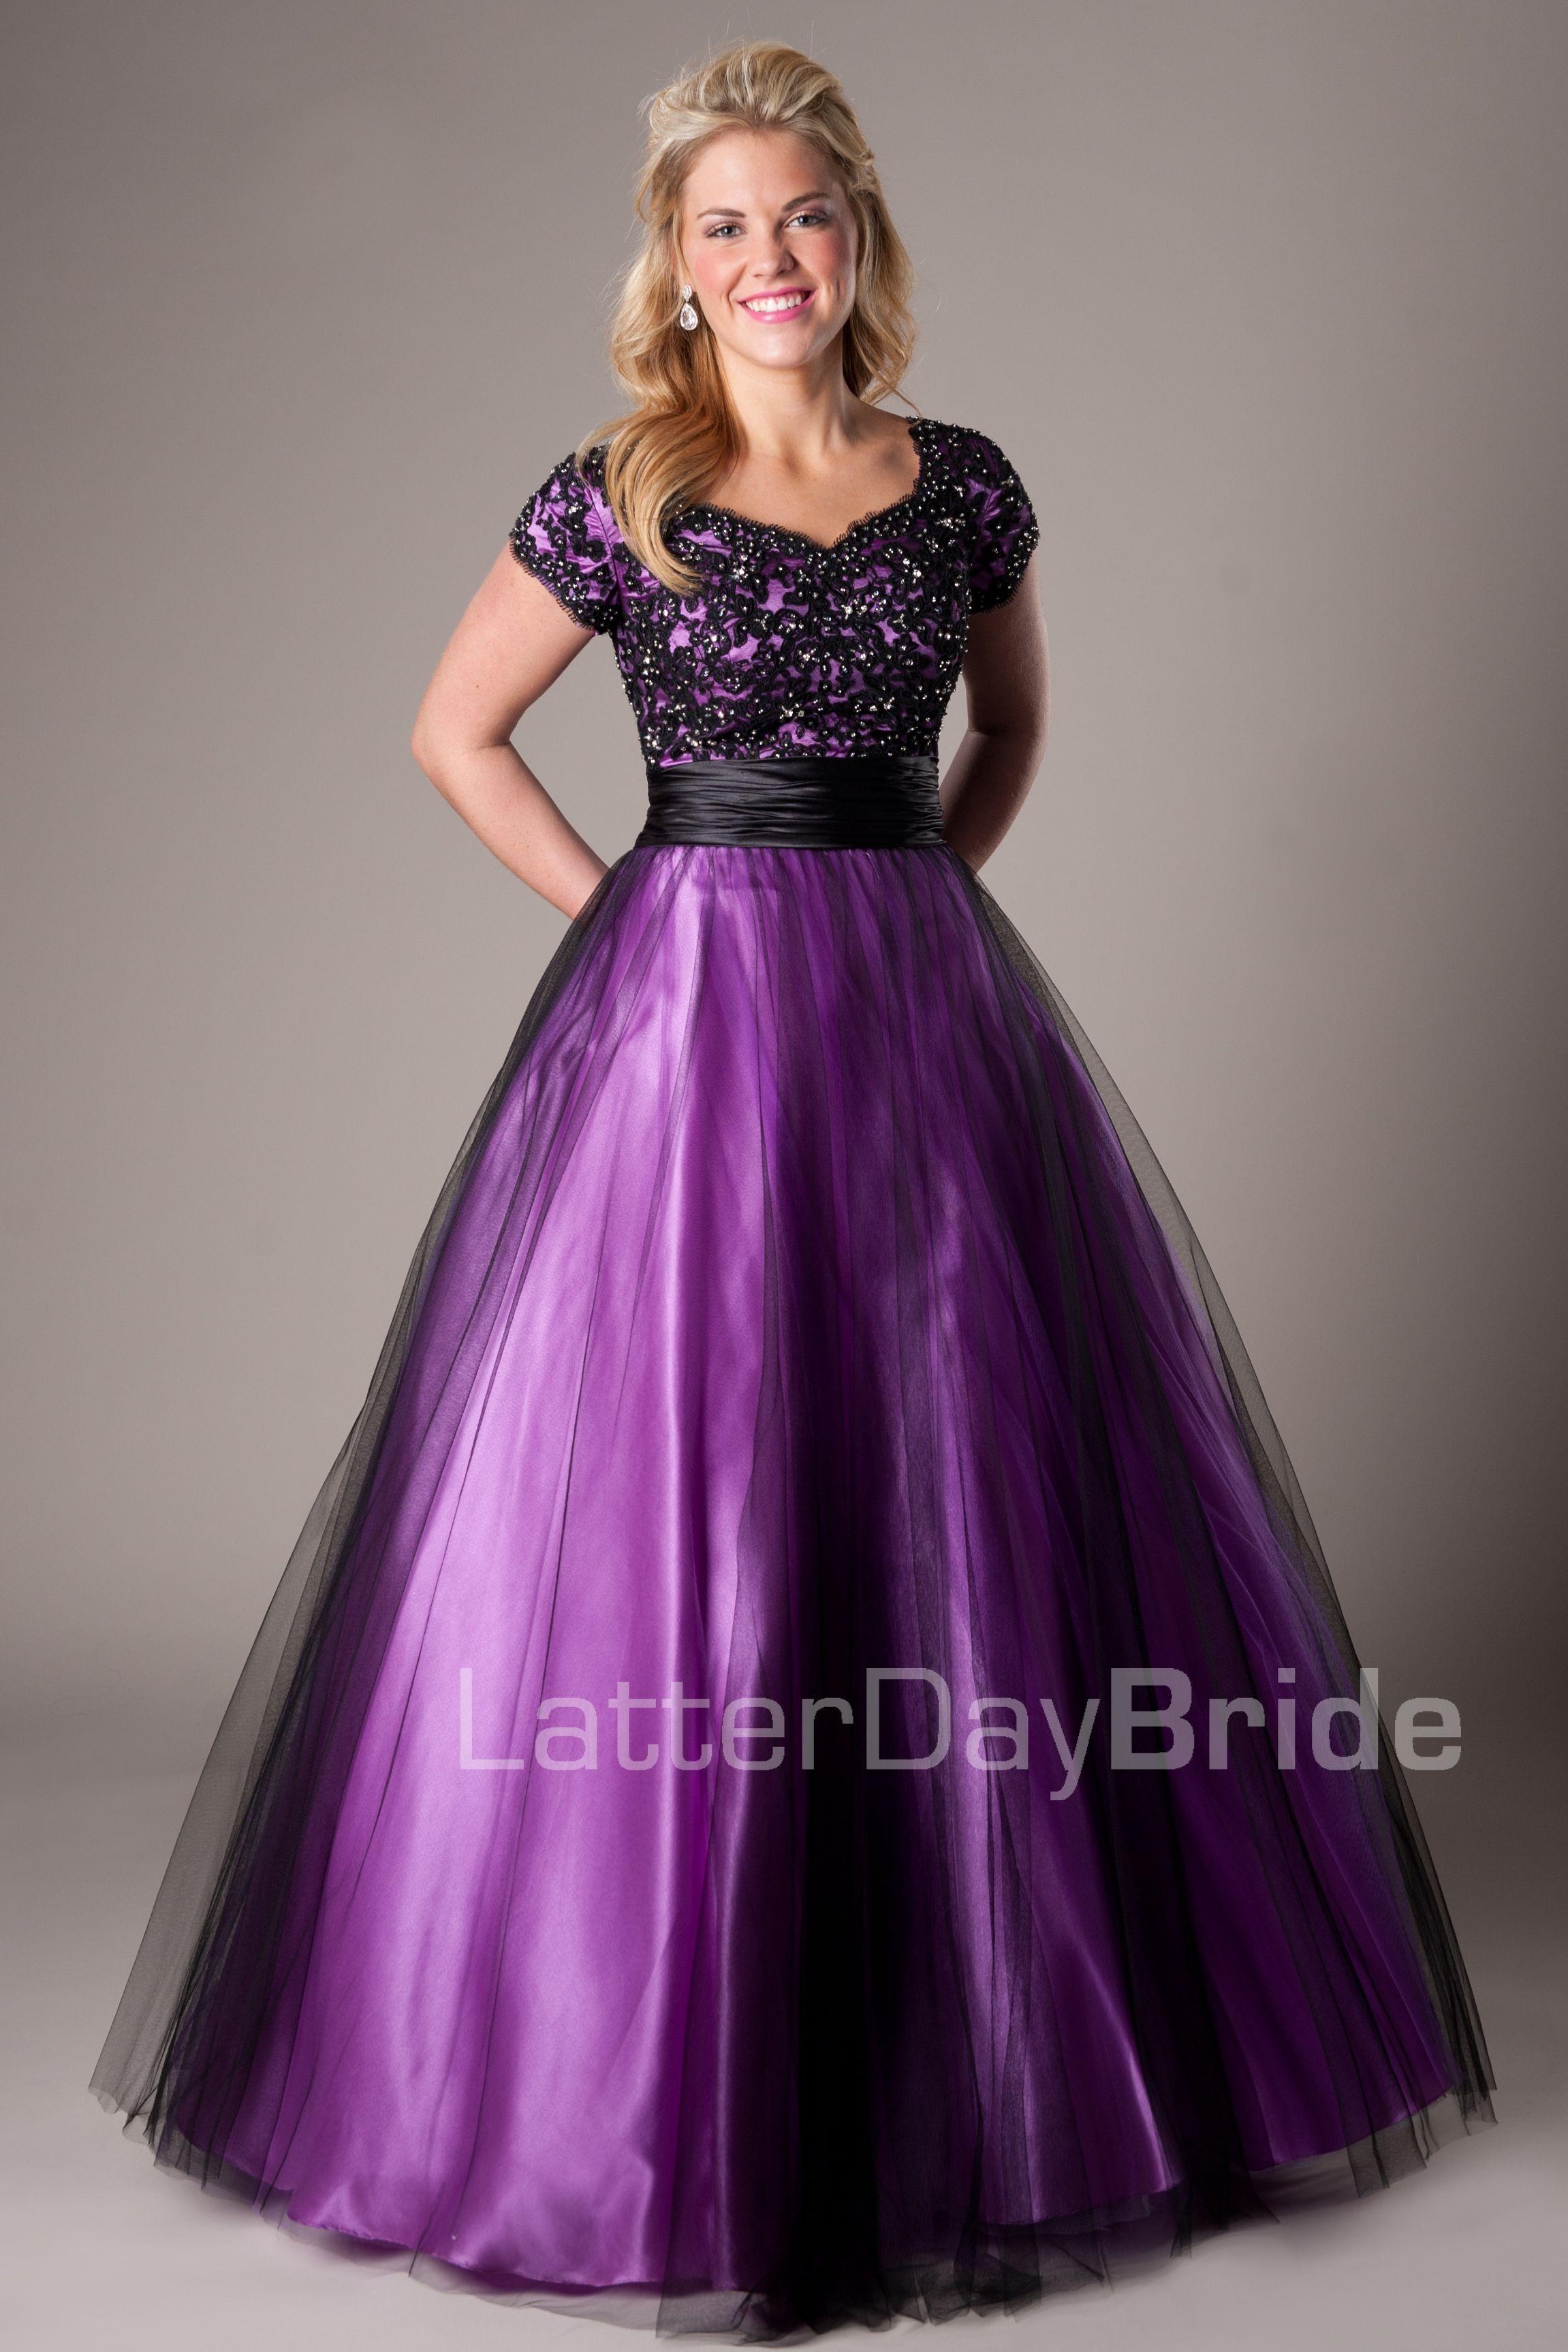 Modest prom dresses prom homecoming formal dance modest blake